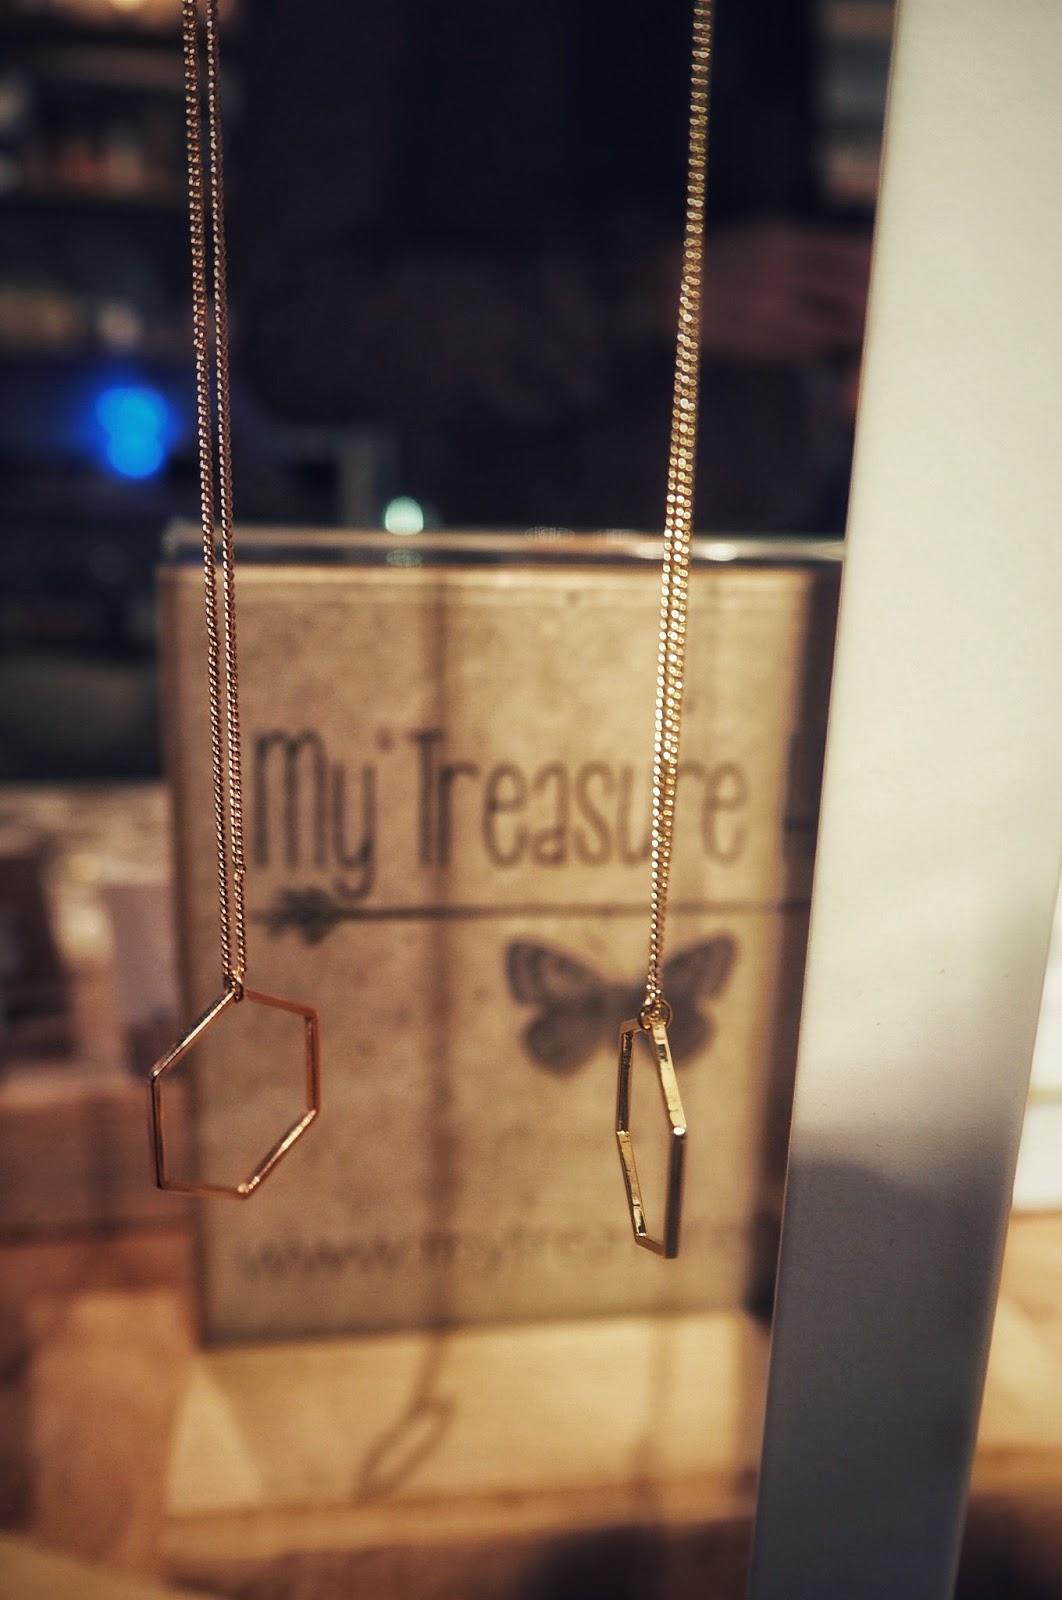 My Treasure Dutch Jewellery Collectiv Store The Hague